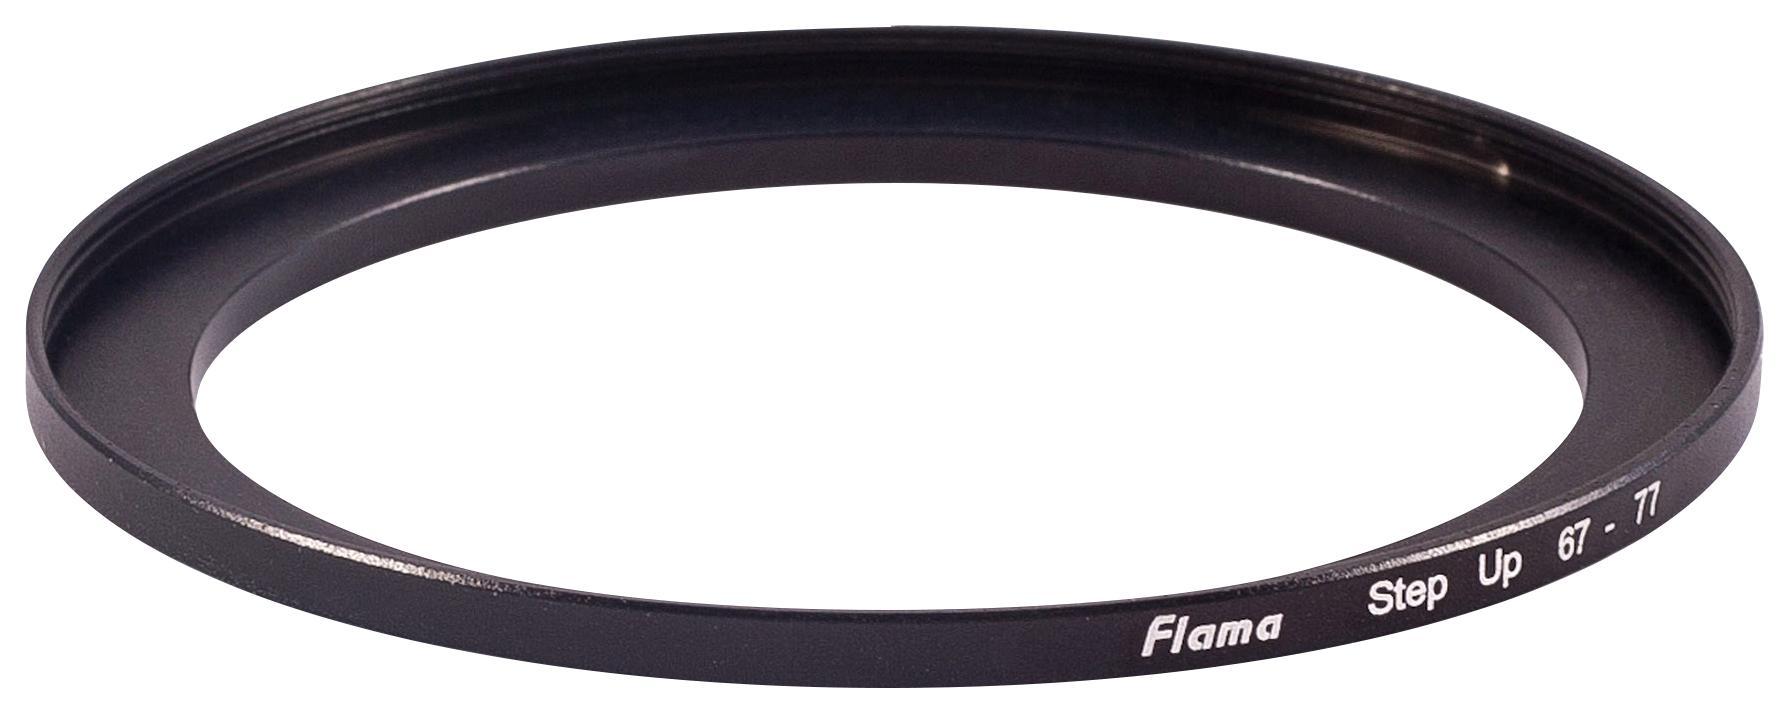 Flama ���������� ������ ��� ������� 67-77 mm